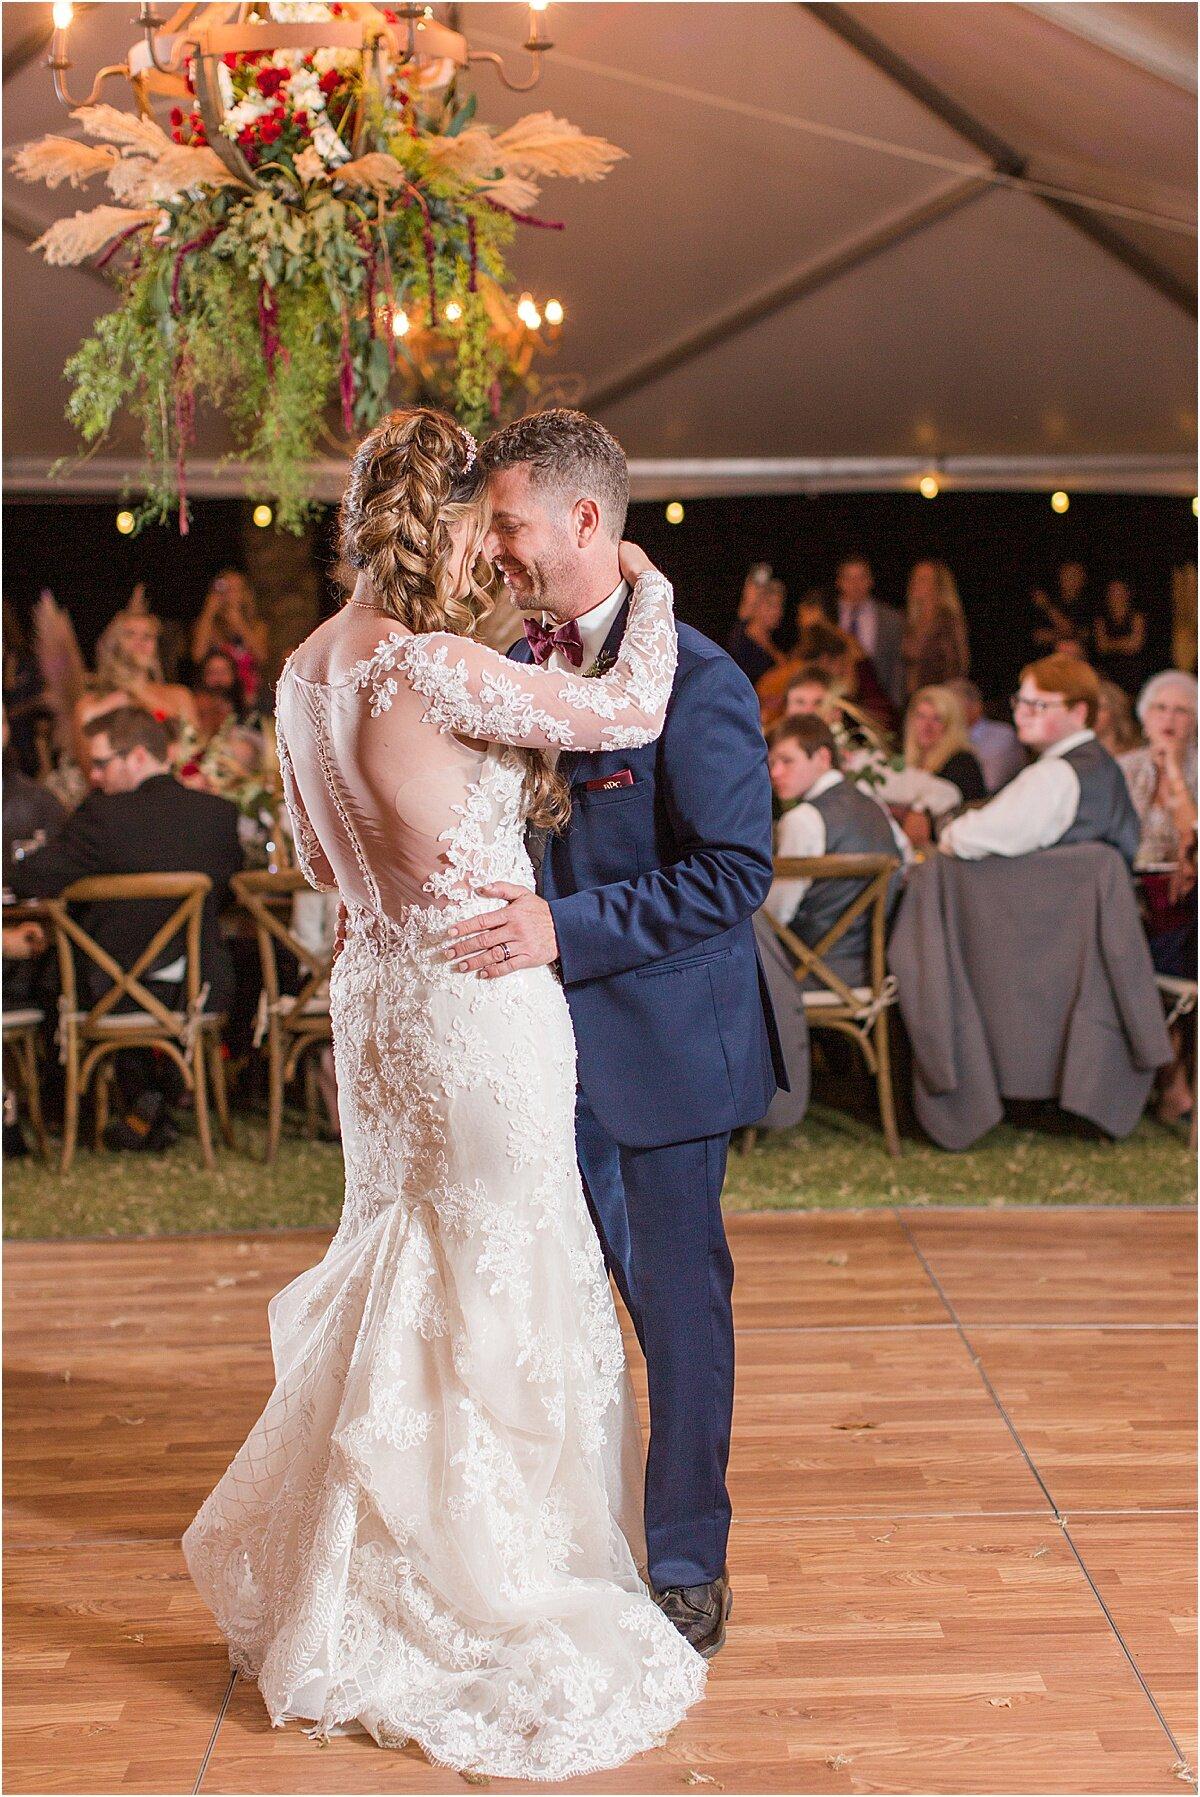 Jersey_Ga_Wedding_Venues_Holly_L_Robbins_Photography_0116.jpg